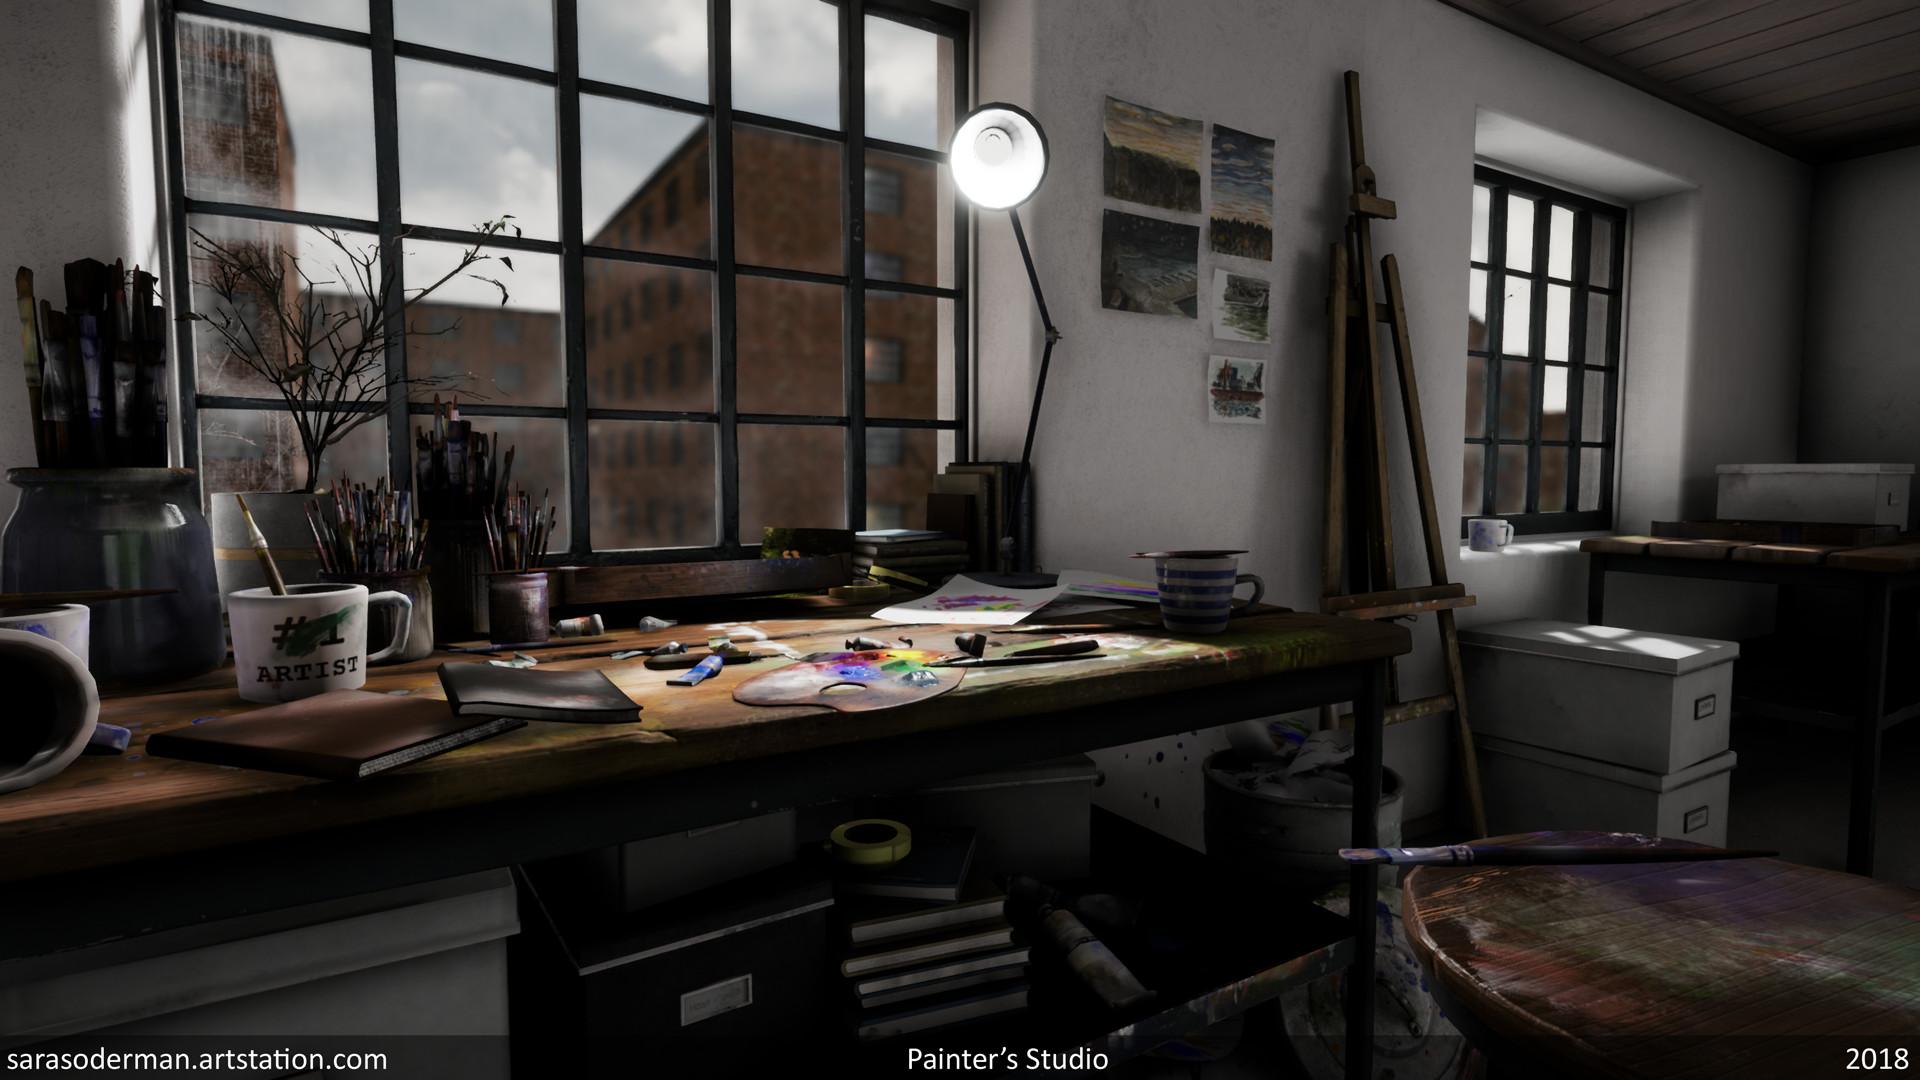 Sara soderman paintrender 04